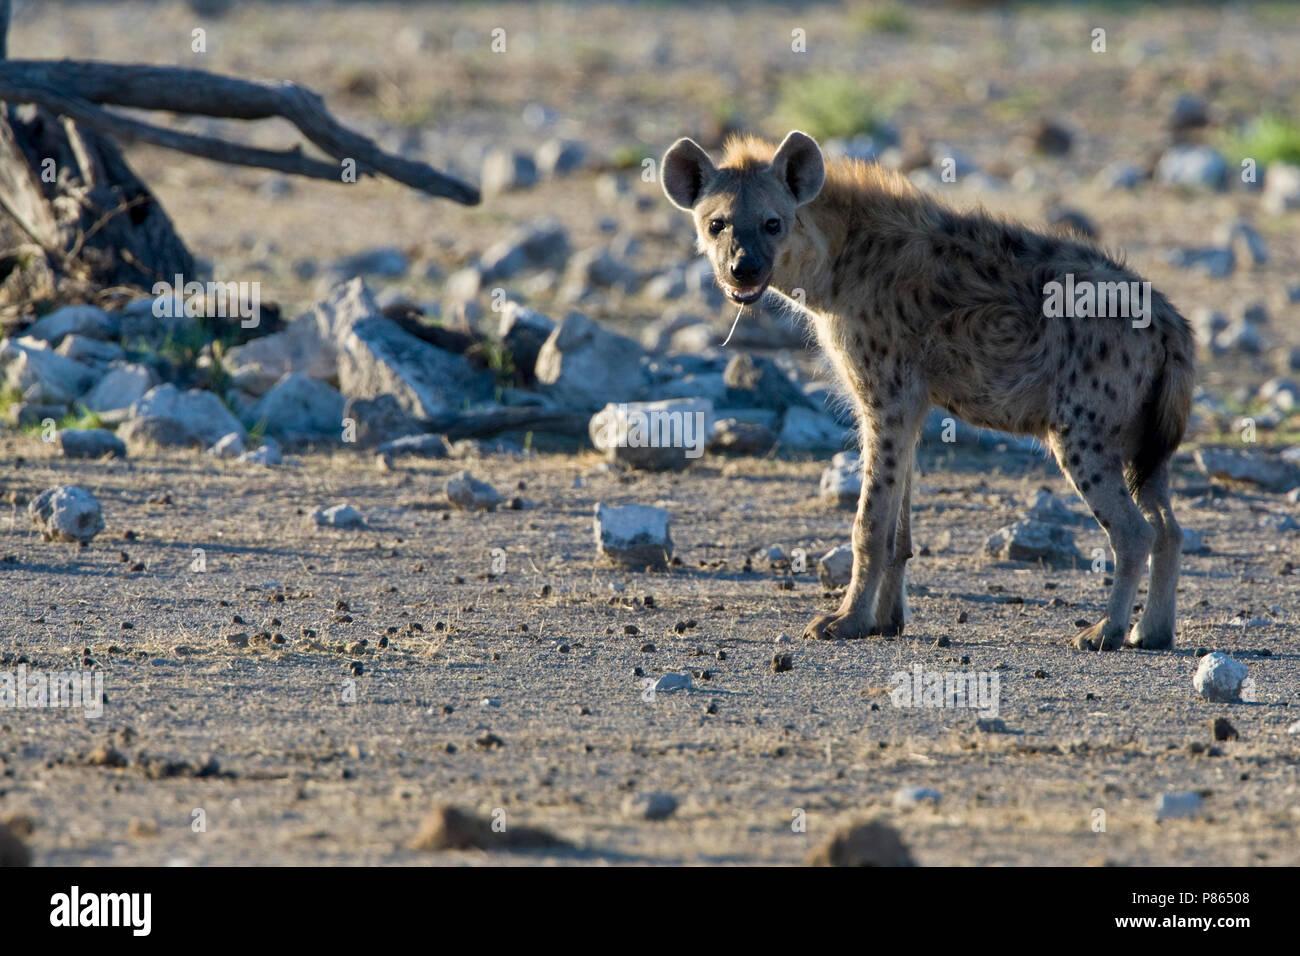 Gevlekte hyena Etosha NP Namibie, Spotted Hyena Etosha NP Namibia - Stock Image